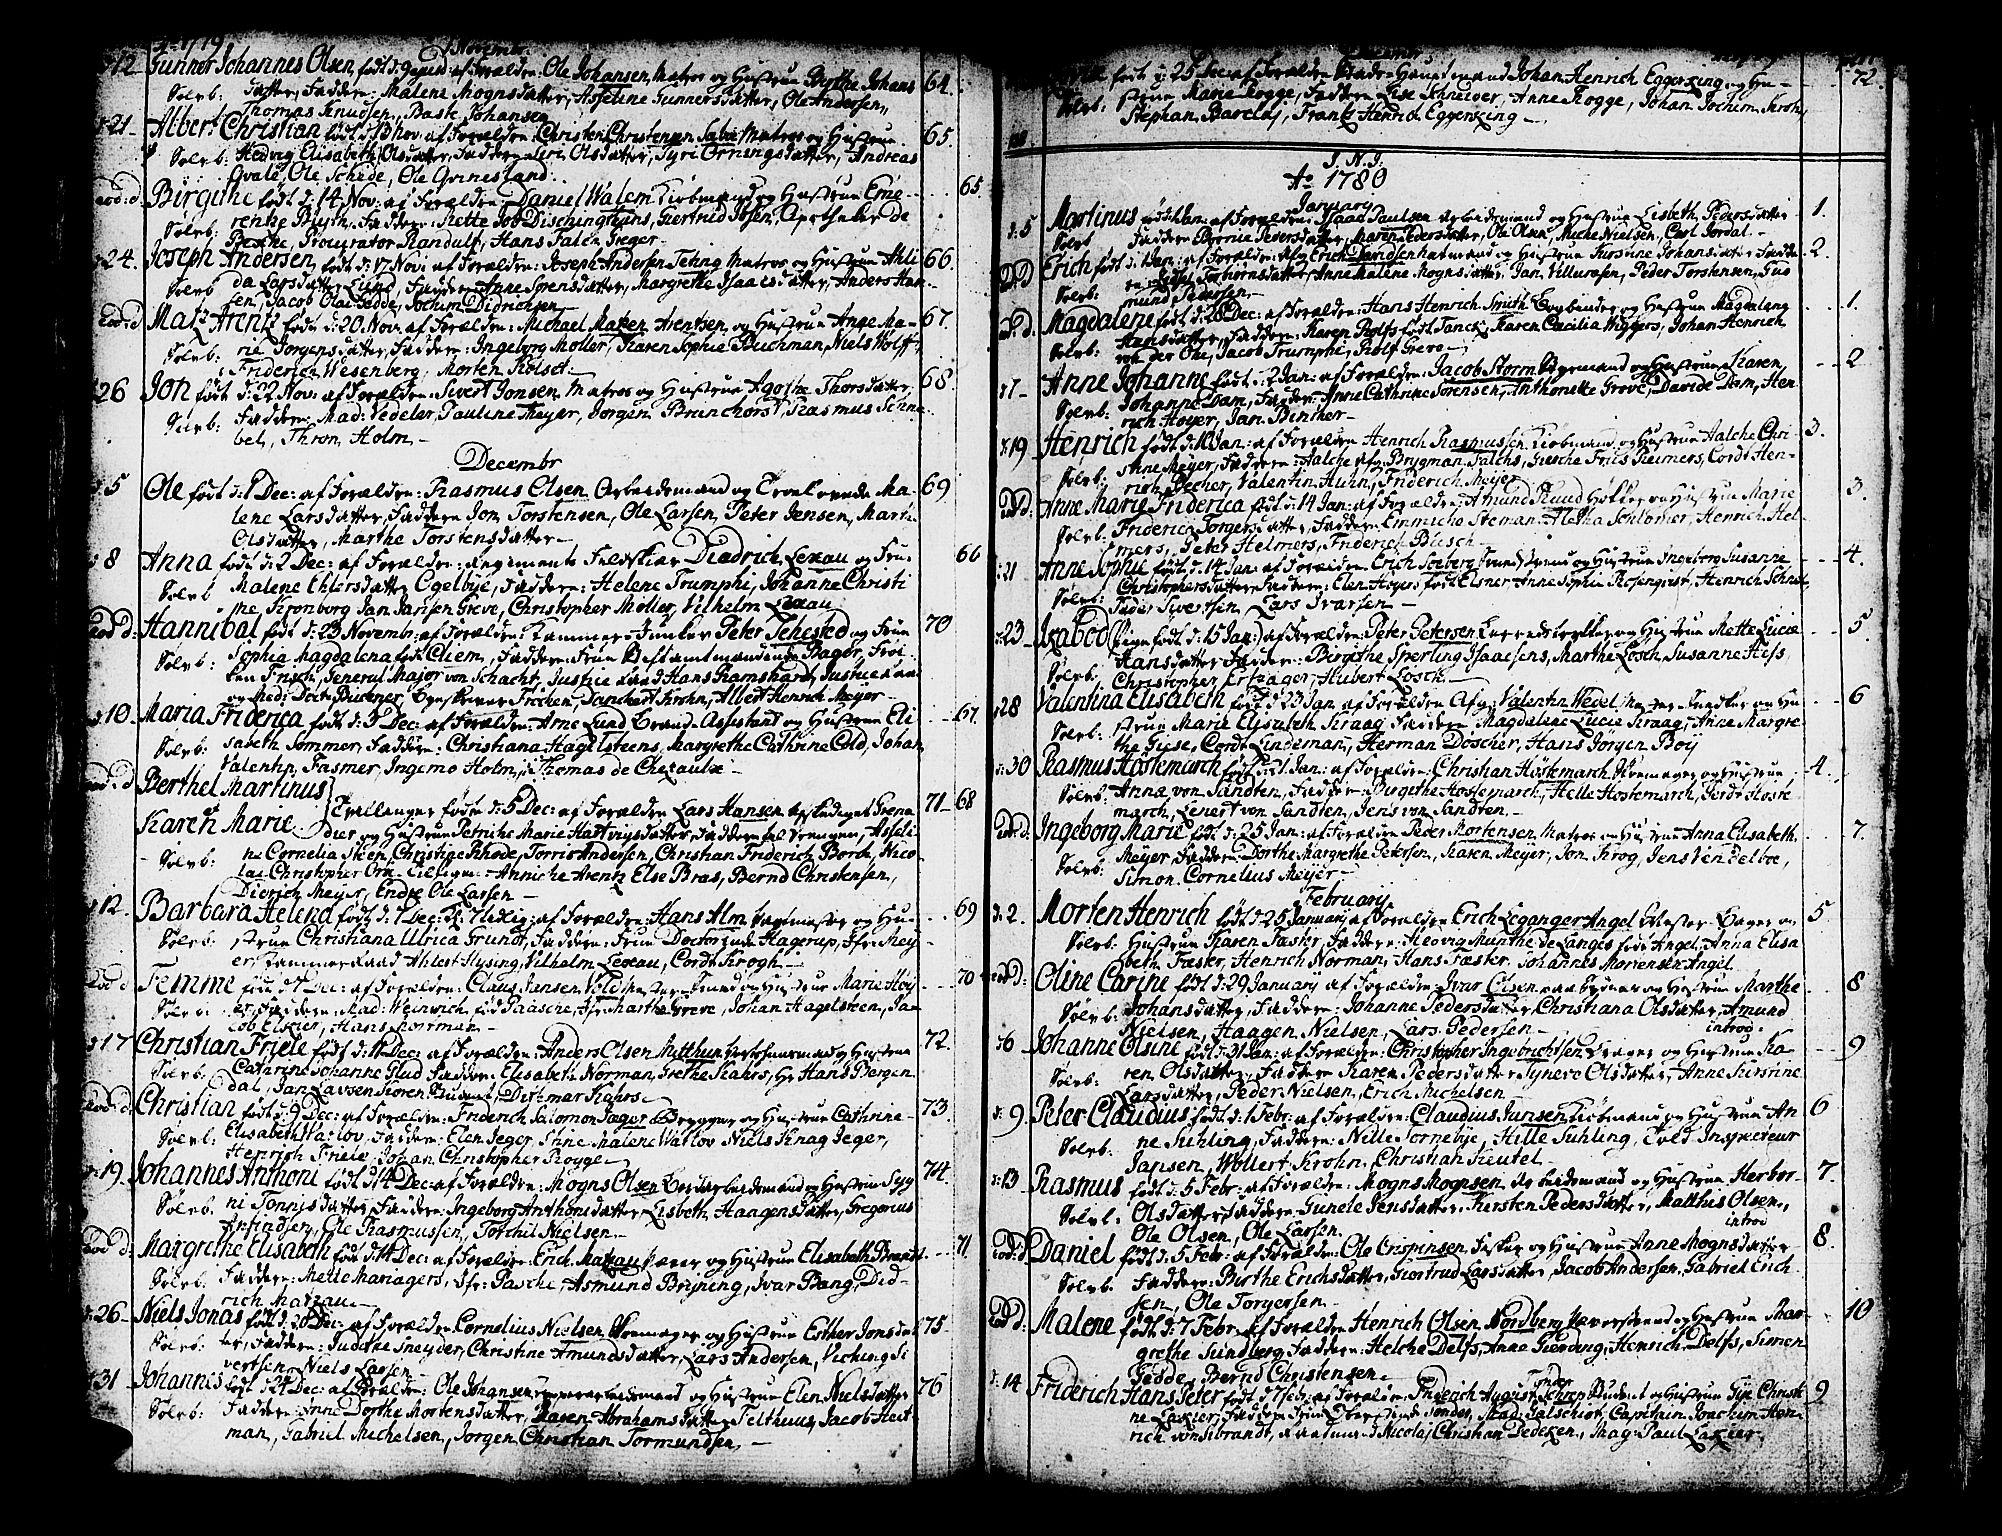 SAB, Domkirken Sokneprestembete, H/Haa/L0003: Ministerialbok nr. A 3, 1758-1789, s. 216-217